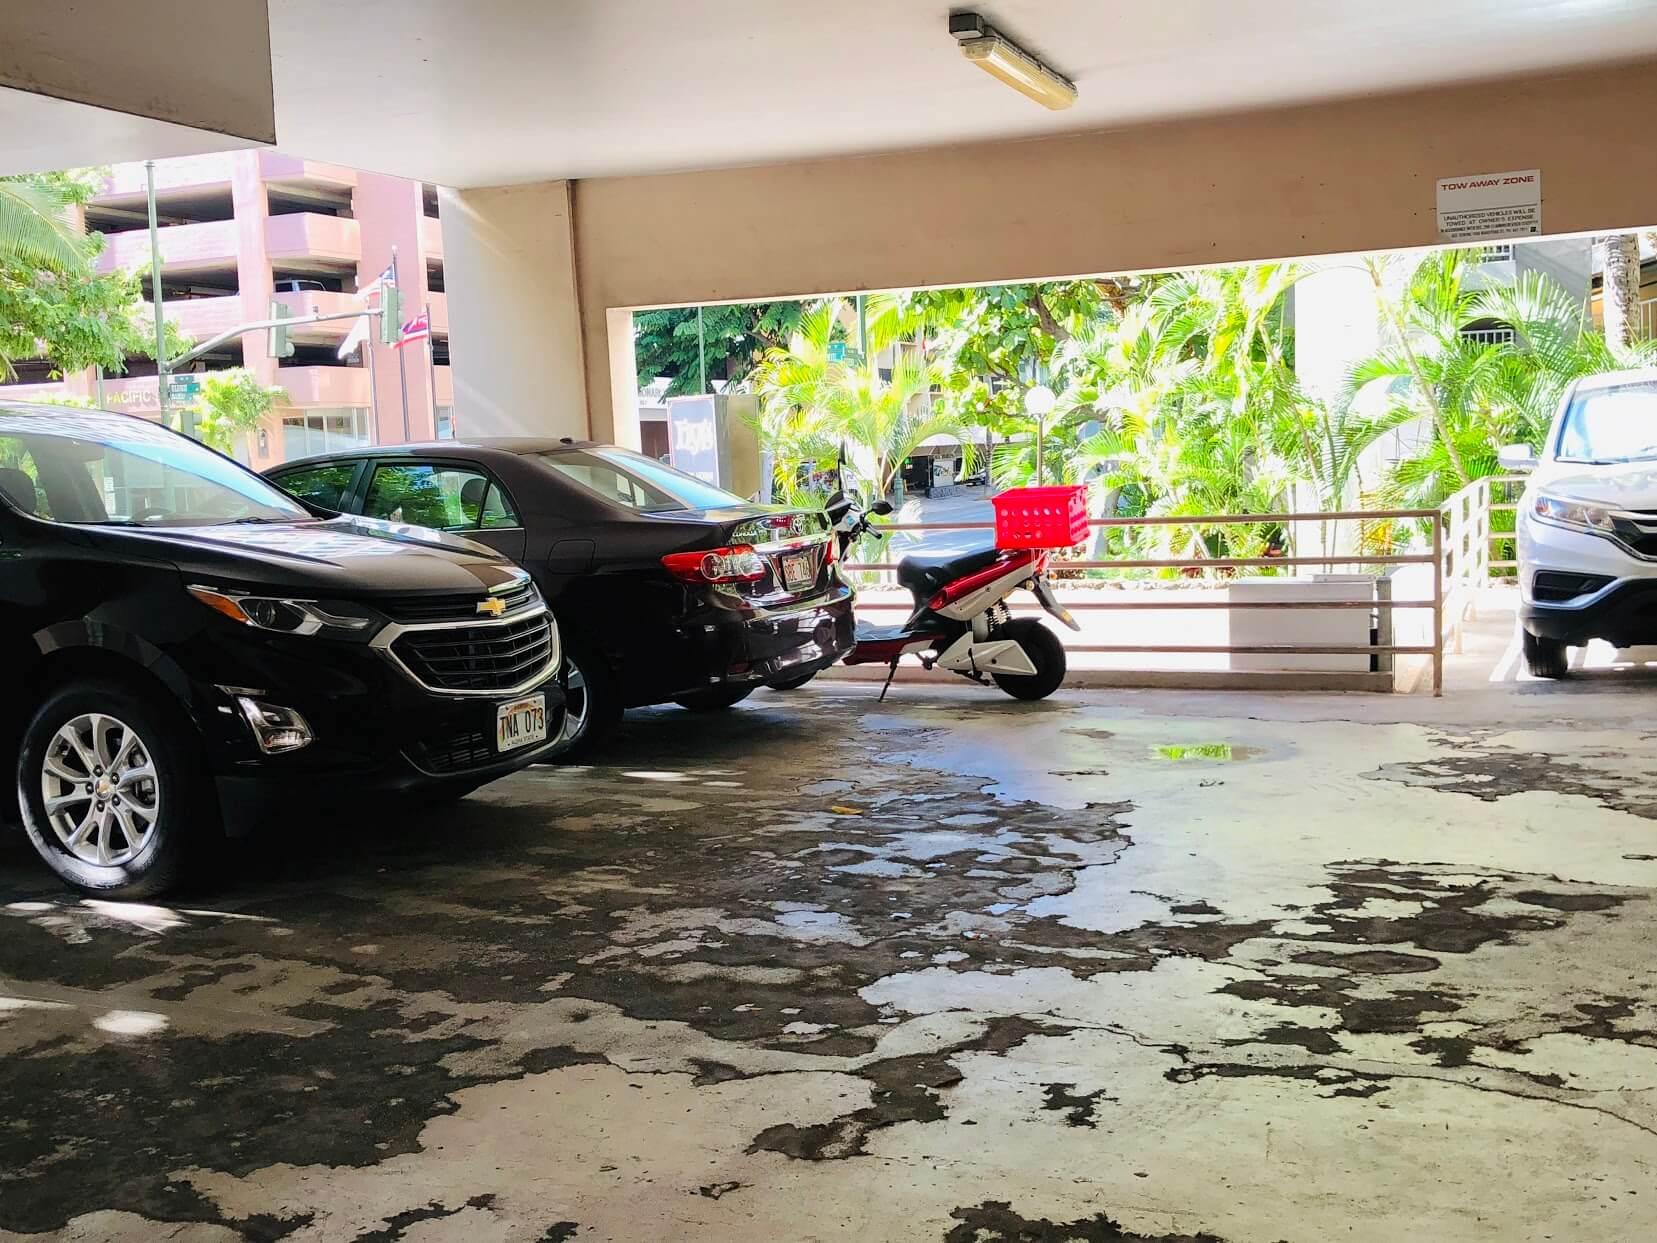 Kuhio Plazaの駐車場